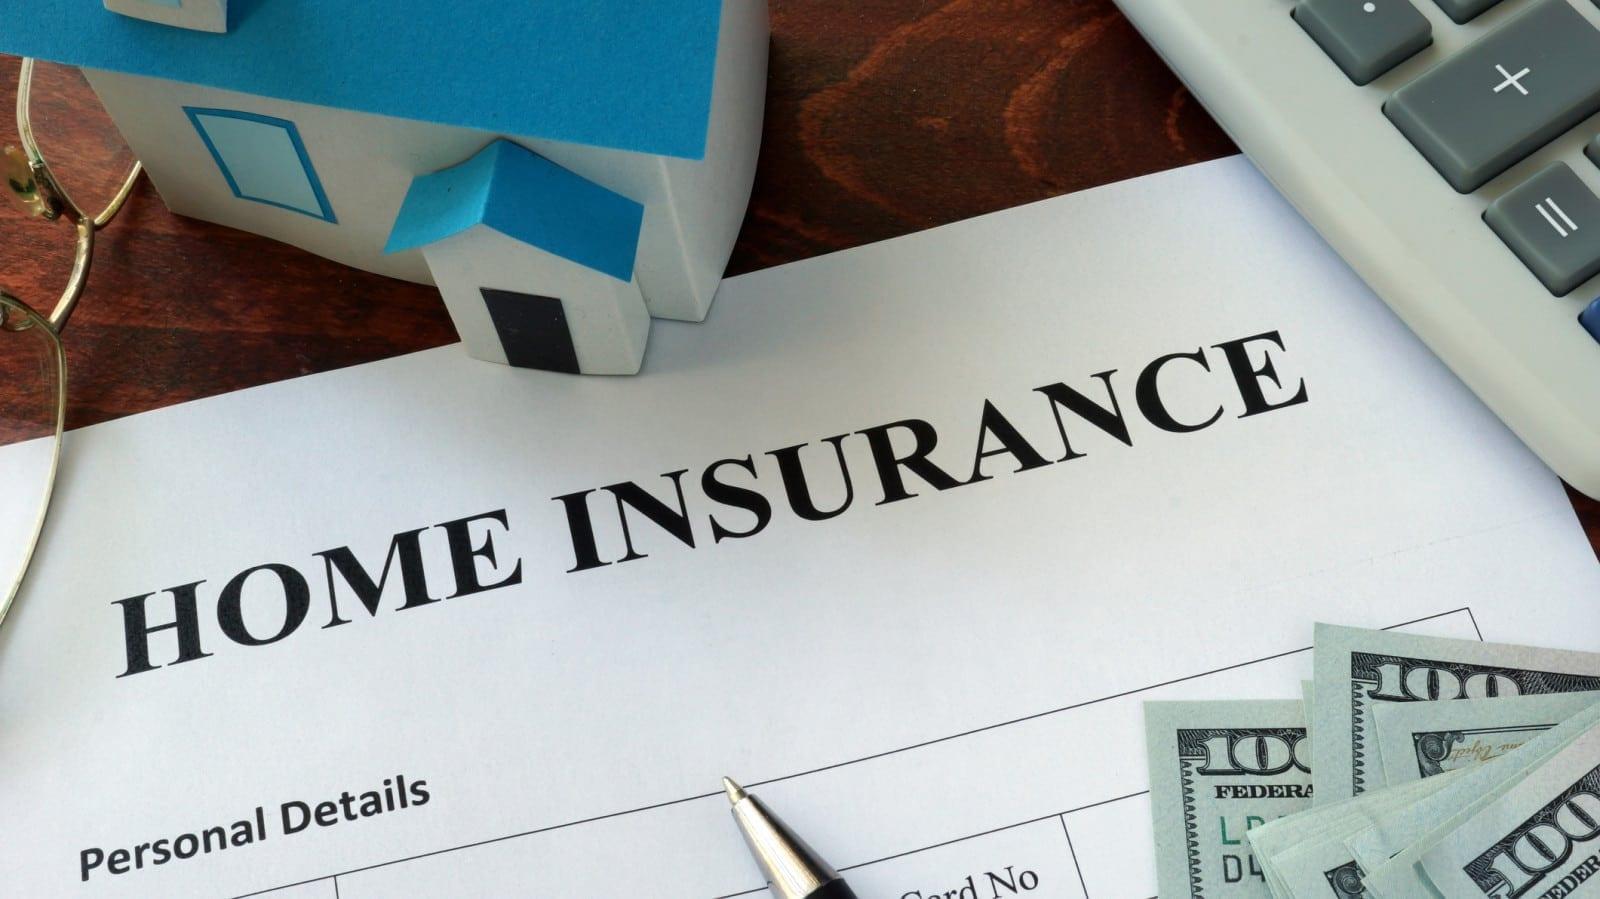 Home Insurance Documentation Stock Photo